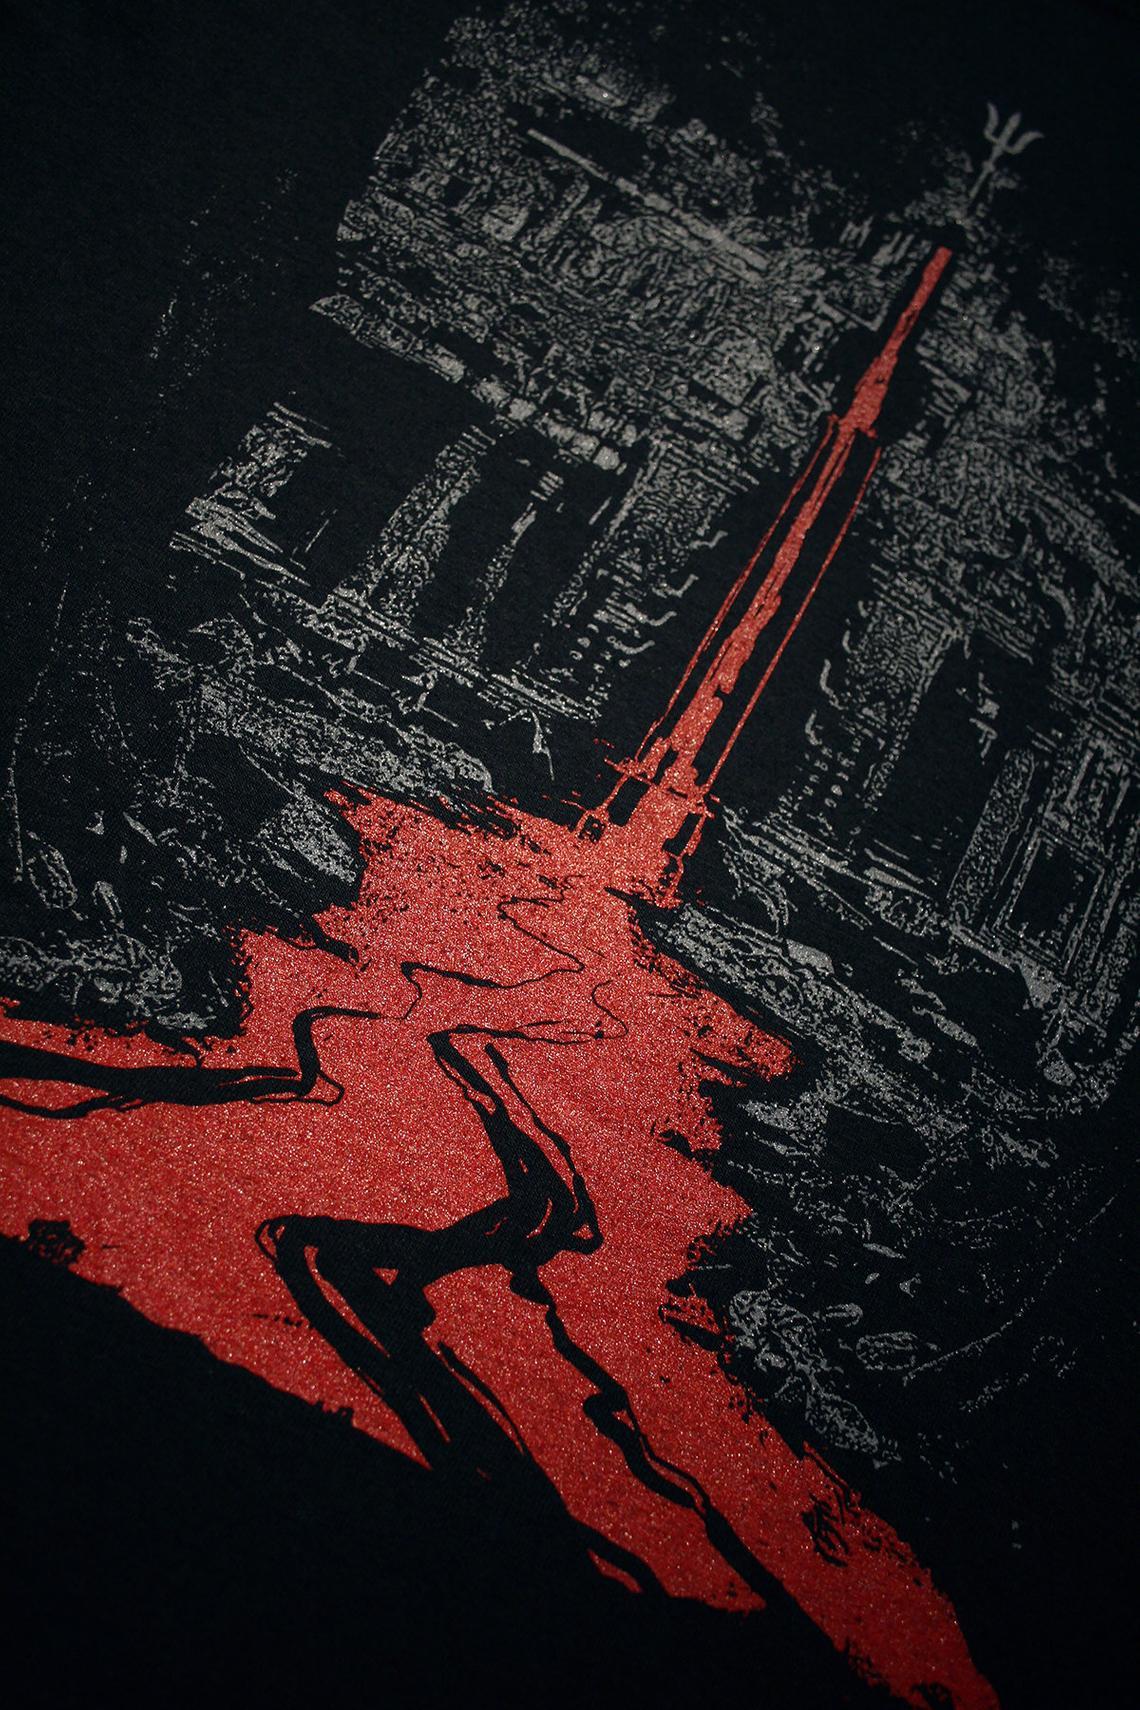 Bleeding Temple Trident Black